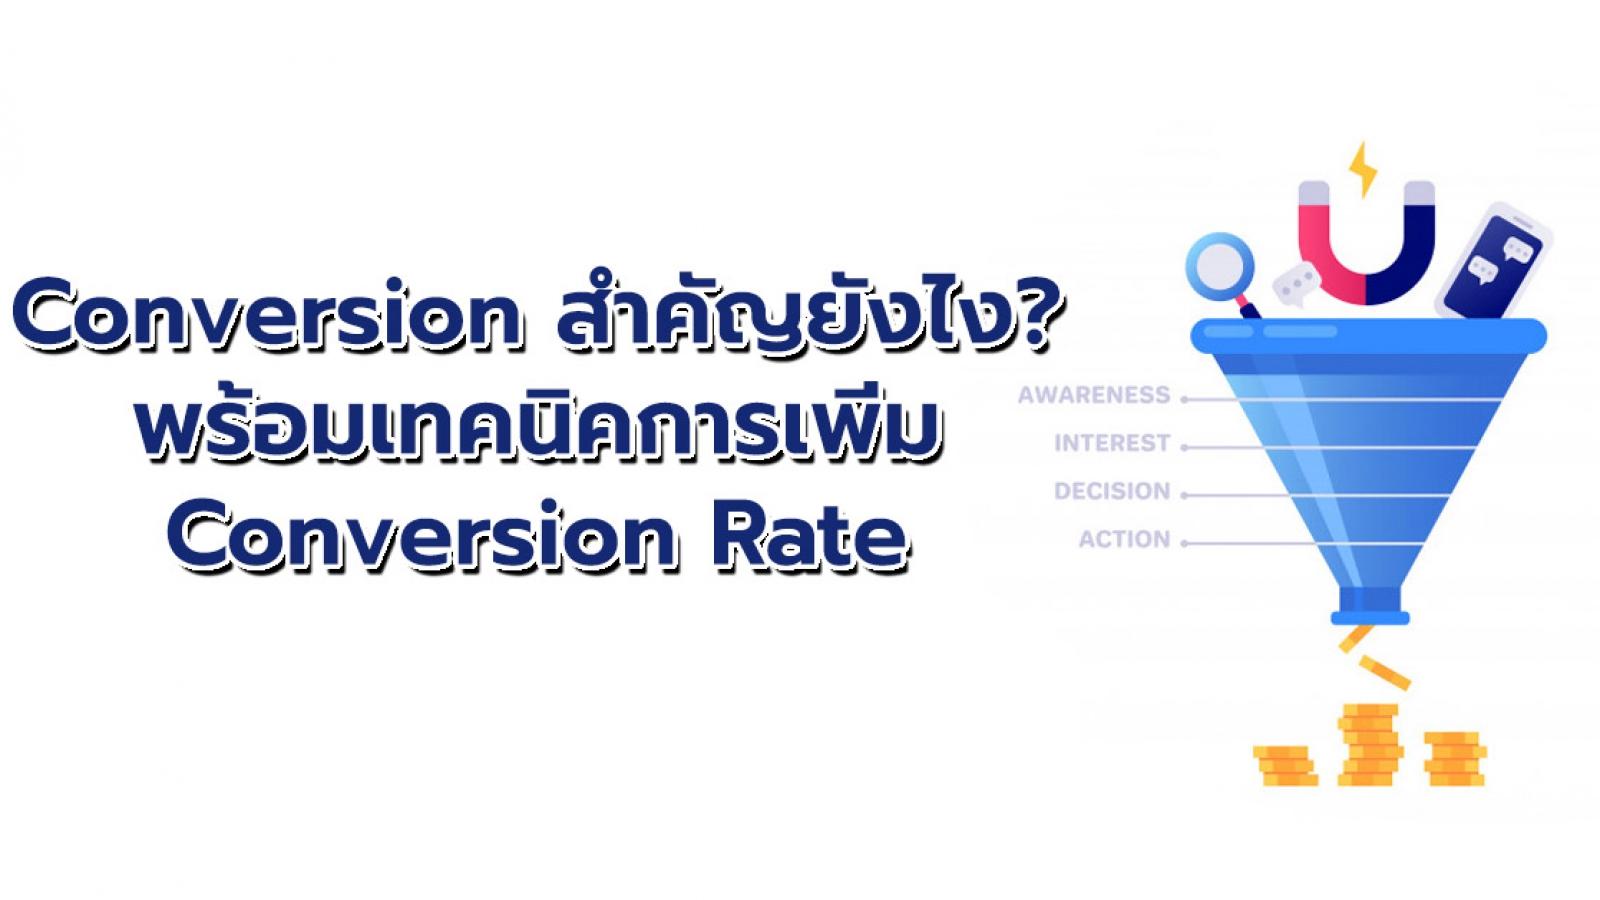 Conversion สำคัญยังไง? พร้อมเทคนิคการเพิ่ม Conversion rate